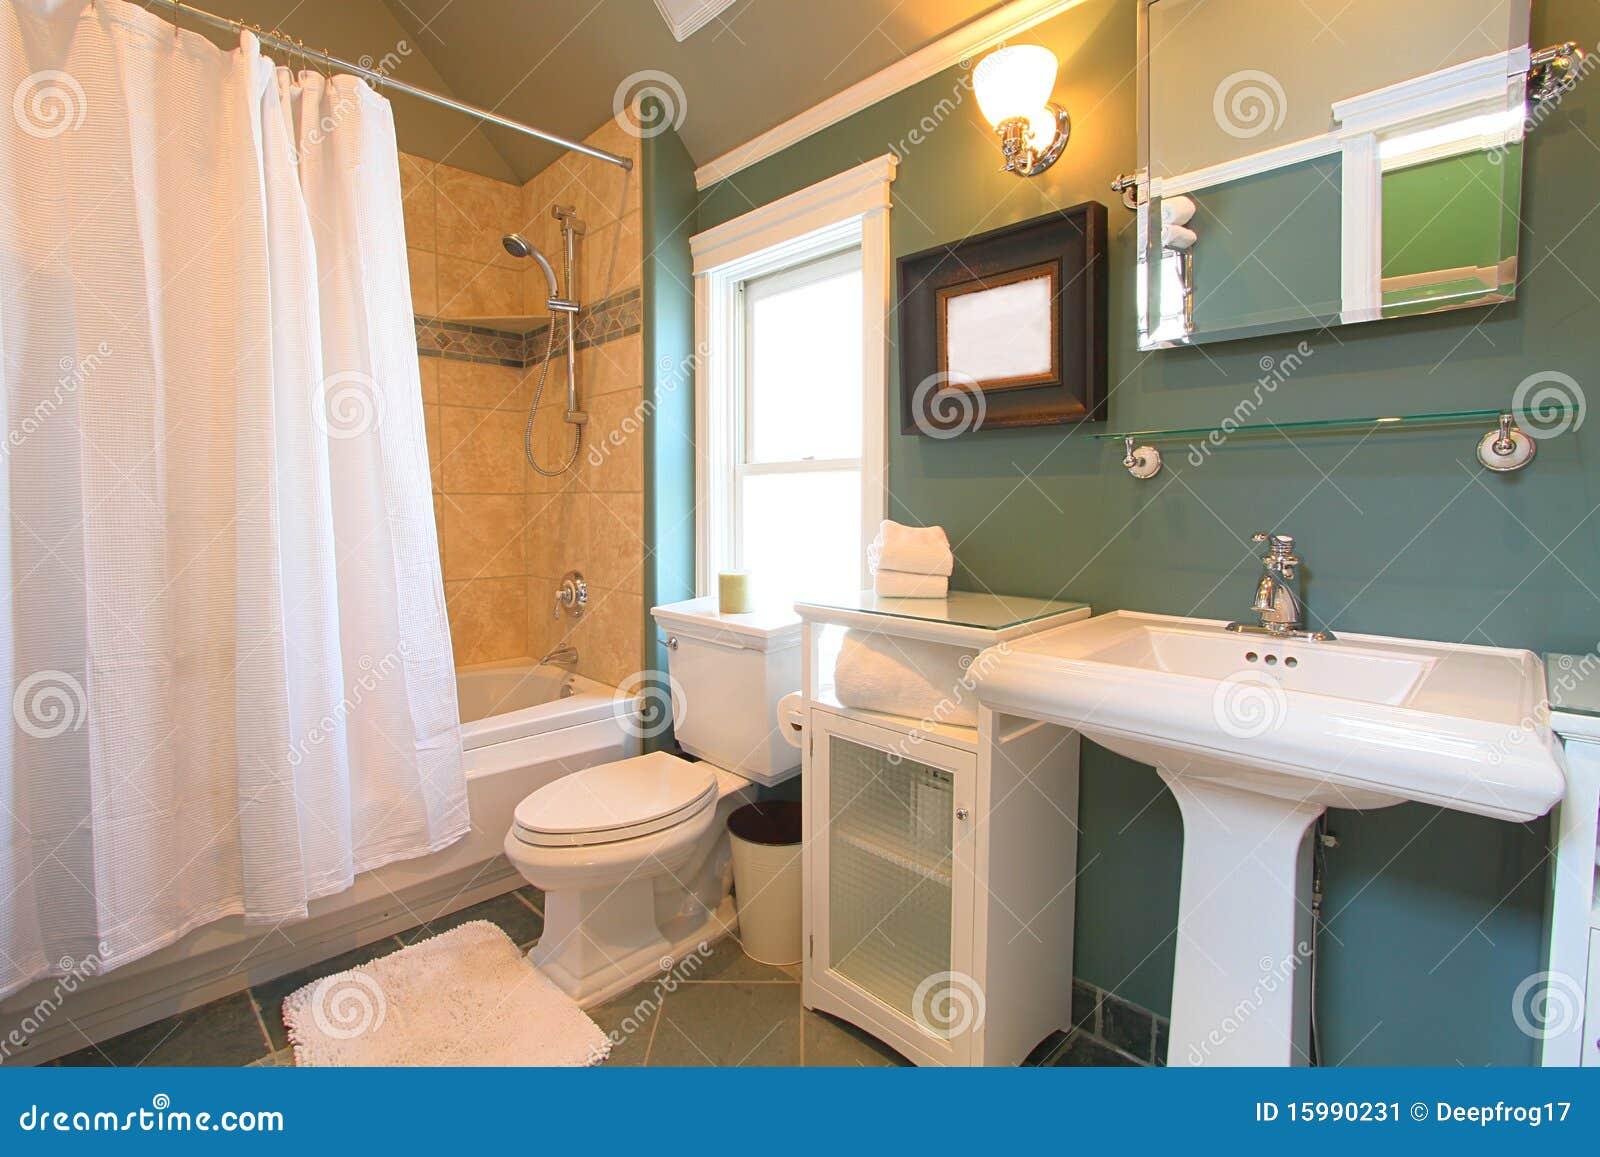 Stanza da bagno moderna immagine stock immagine di - Stanza da bagno ...